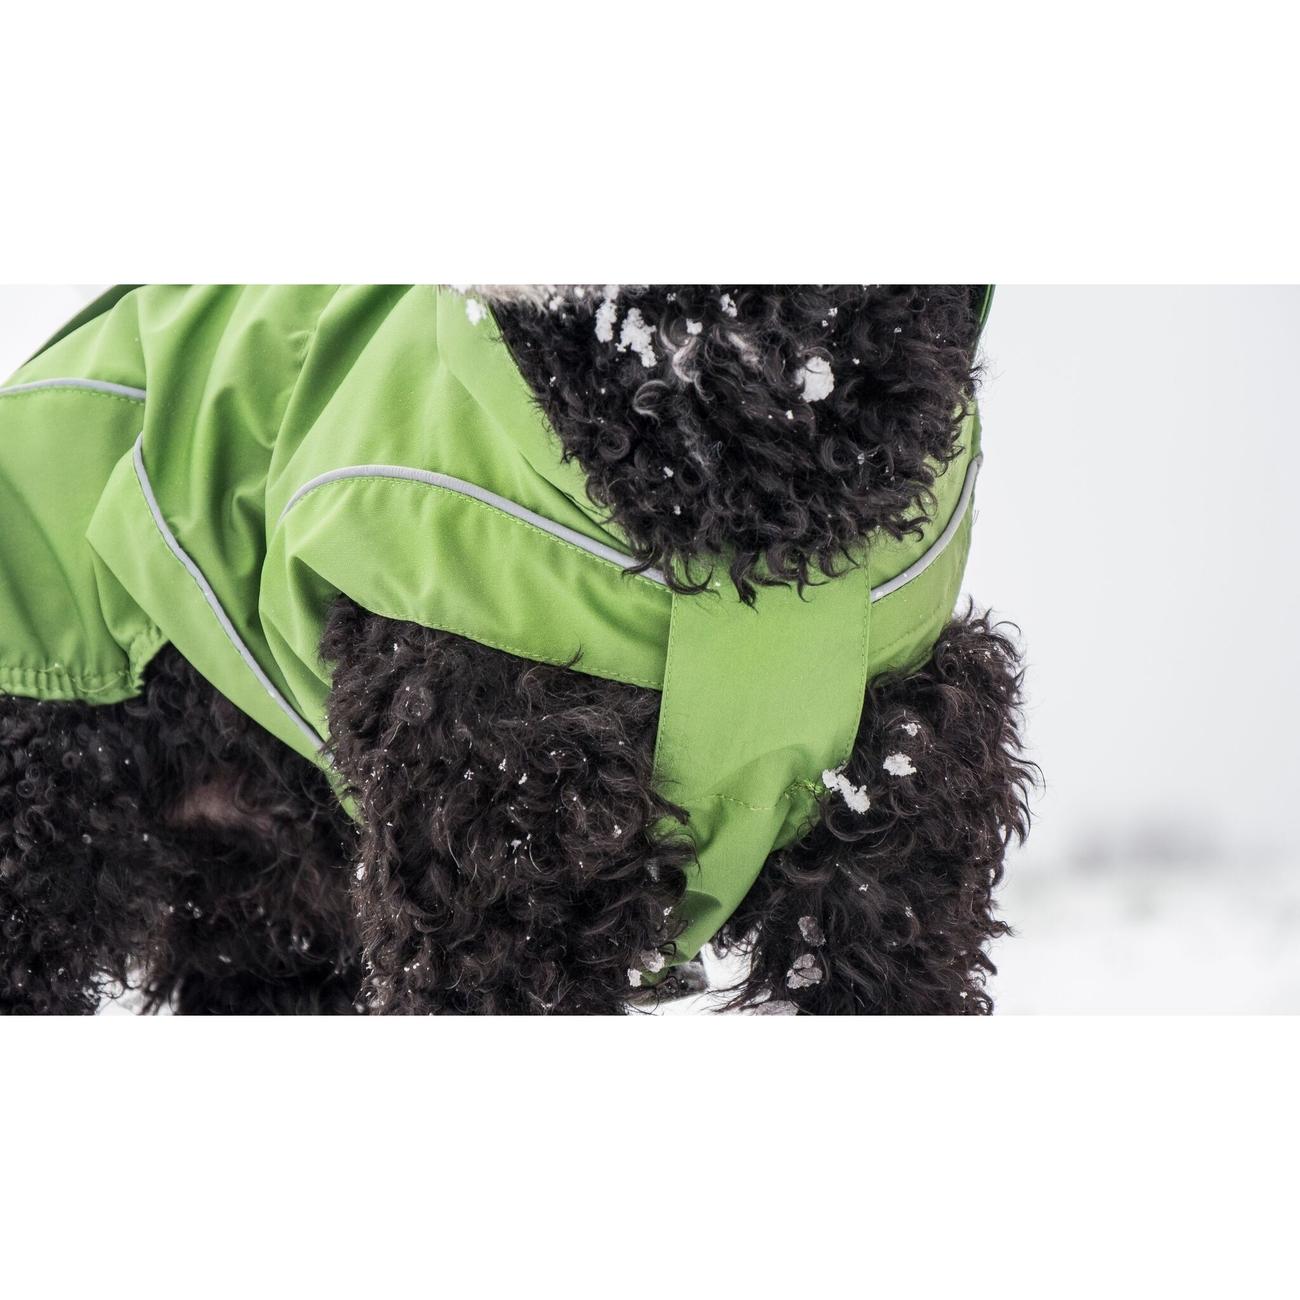 DogBite Hunde Ganzjahres Regenjacke Matt, Bild 4